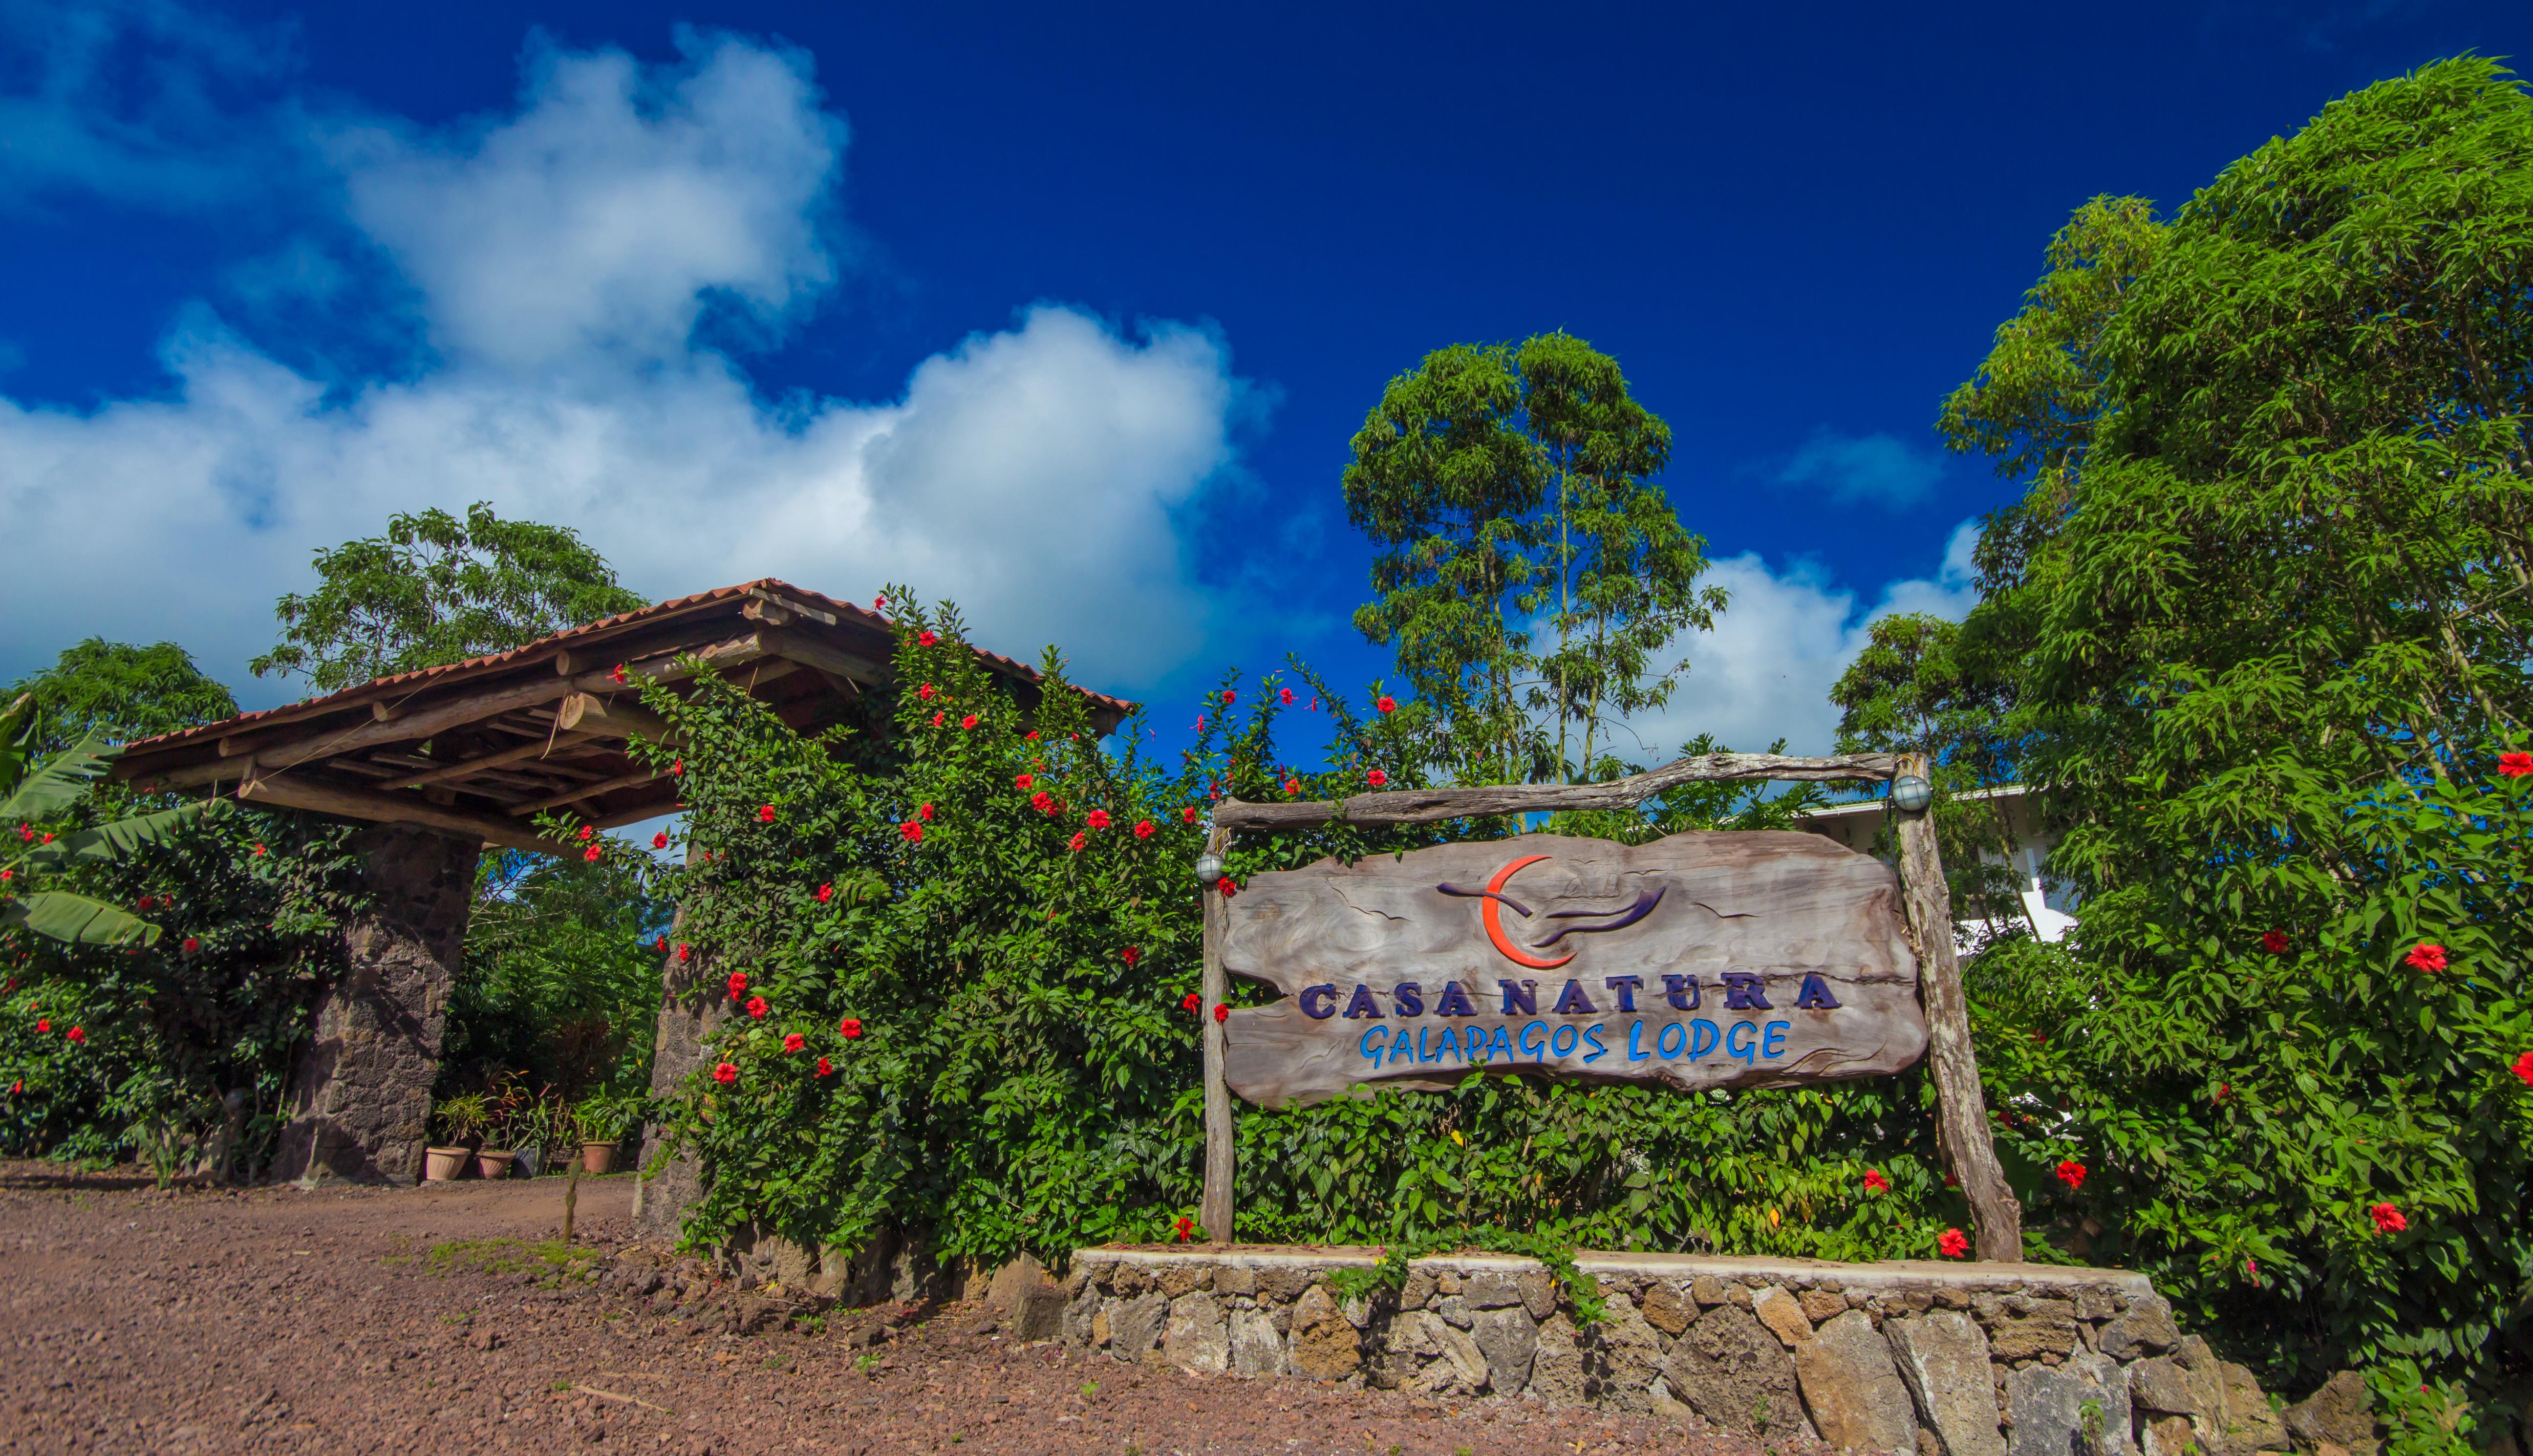 Casa Natura Galapagos Lodge, Santa Cruz